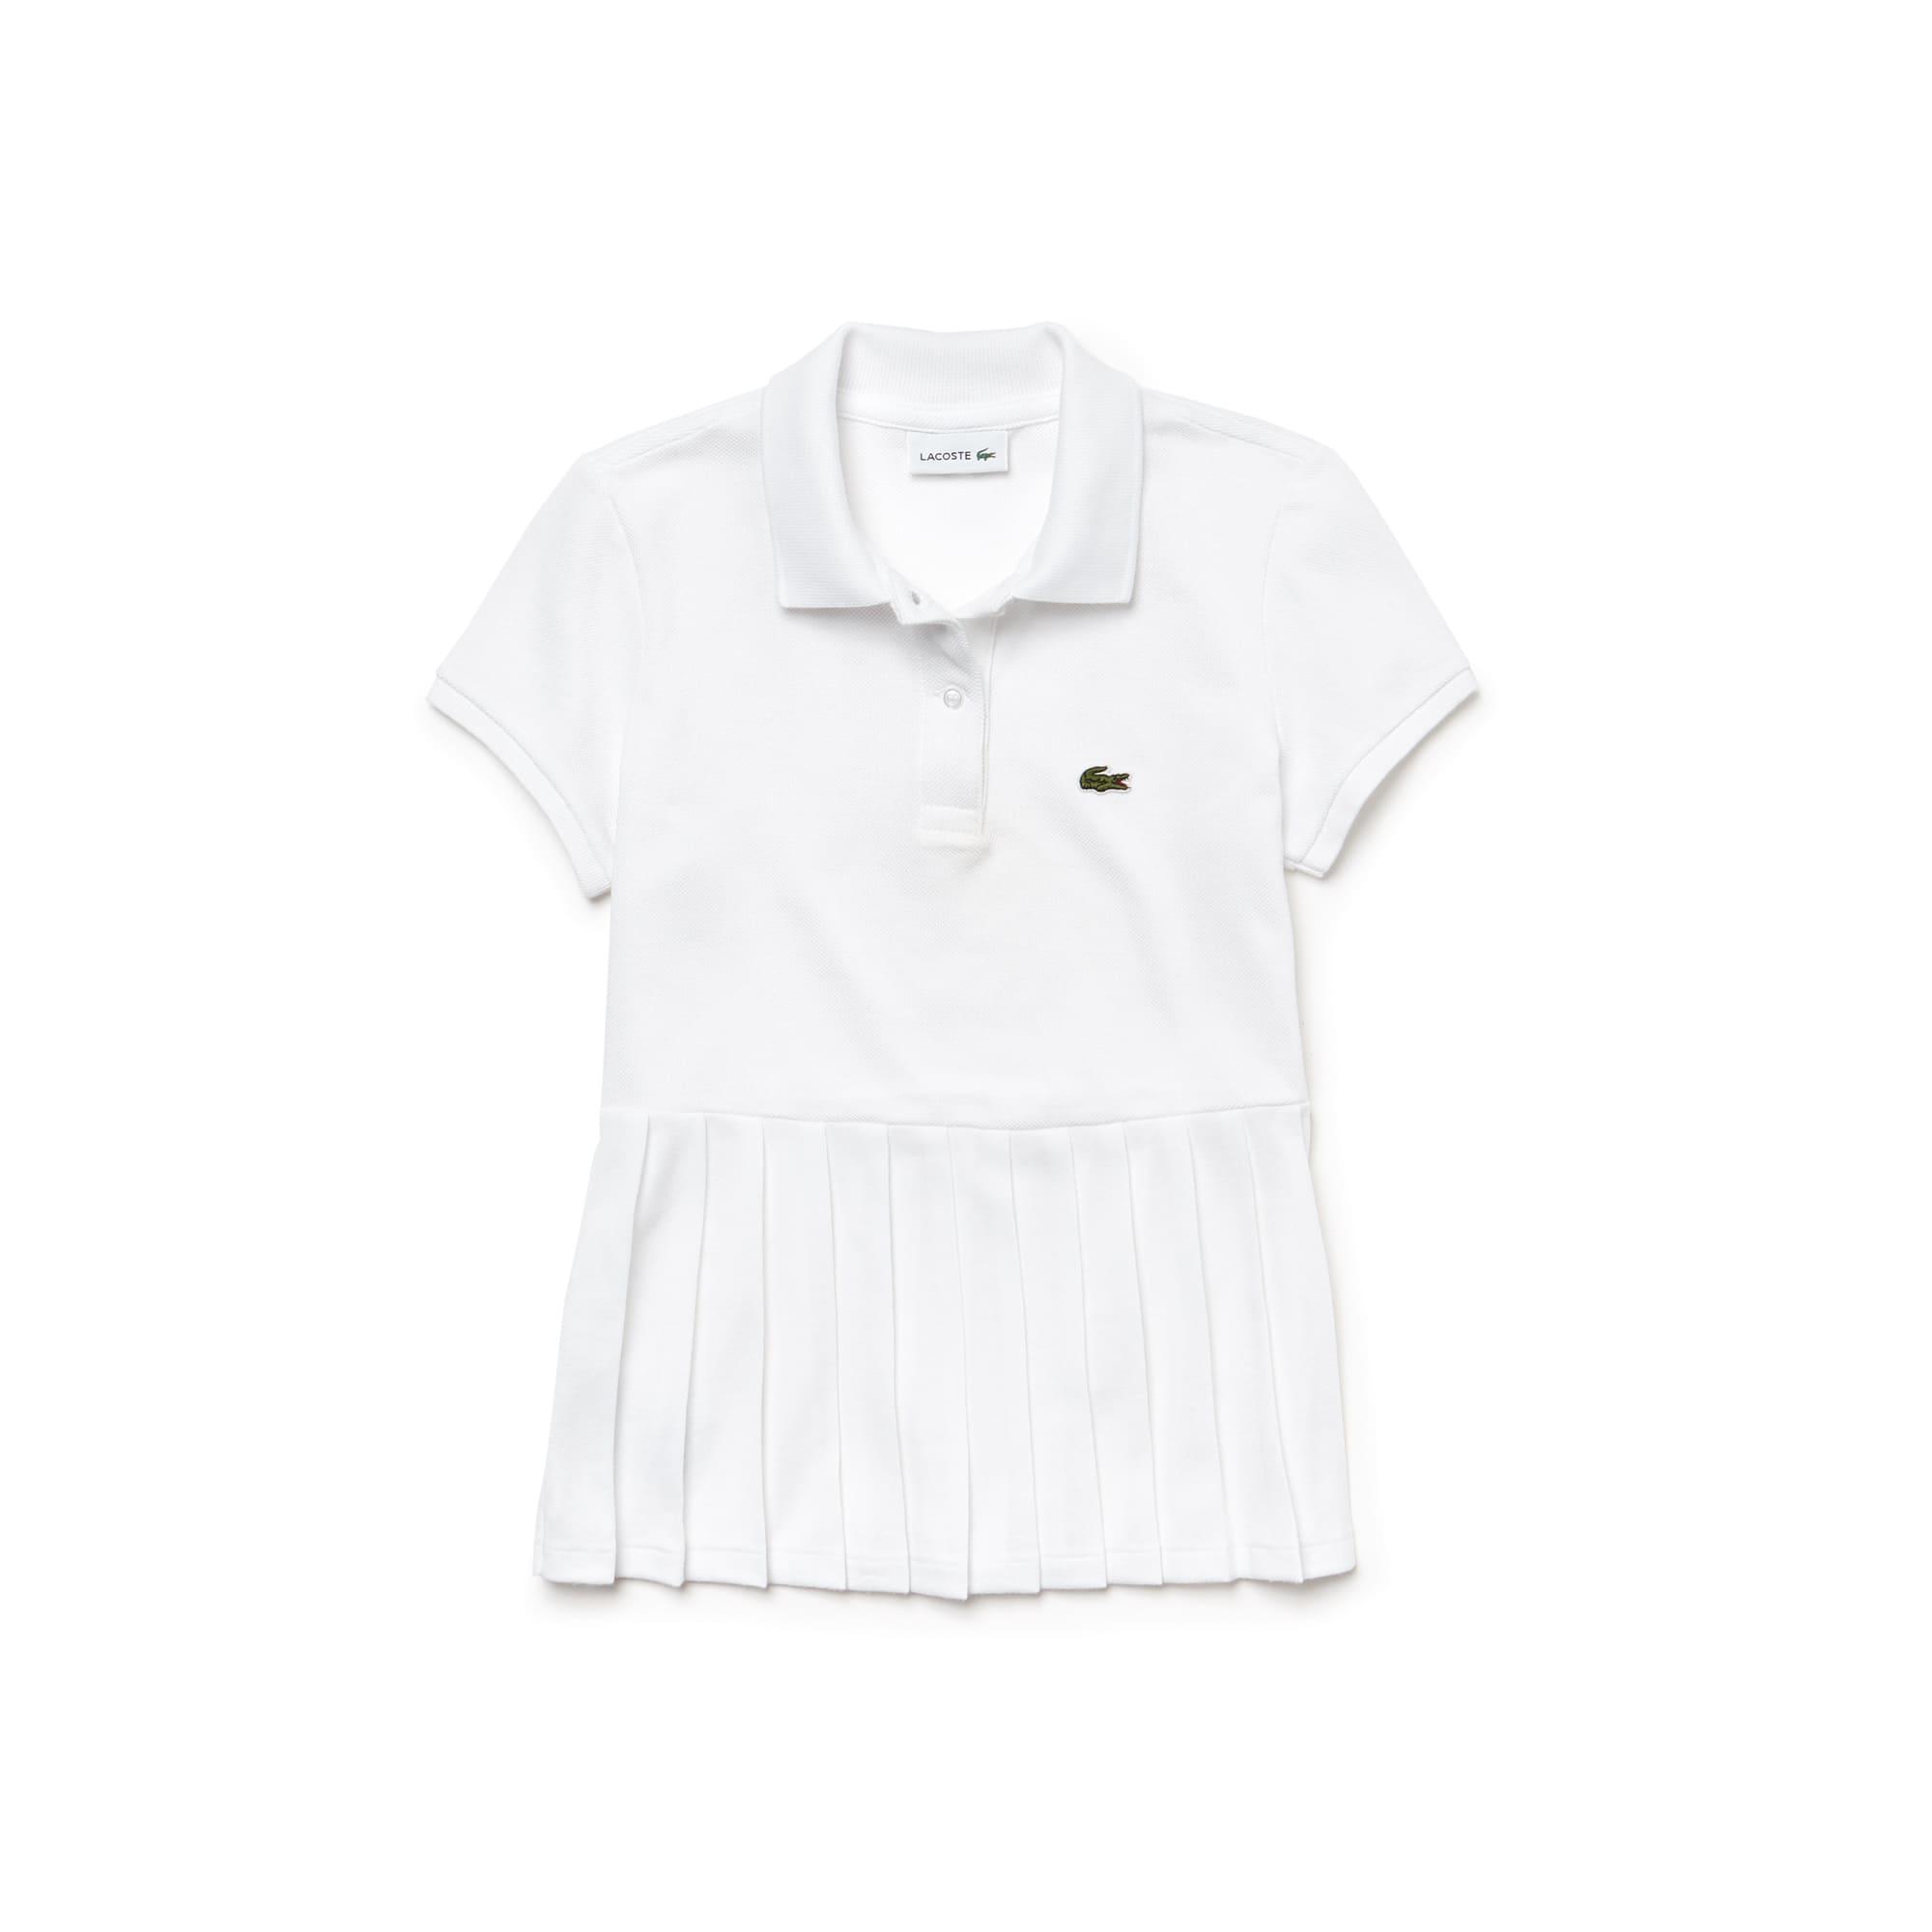 Girls' Lacoste Flat Pleated Cotton Petit Piqué Polo Shirt